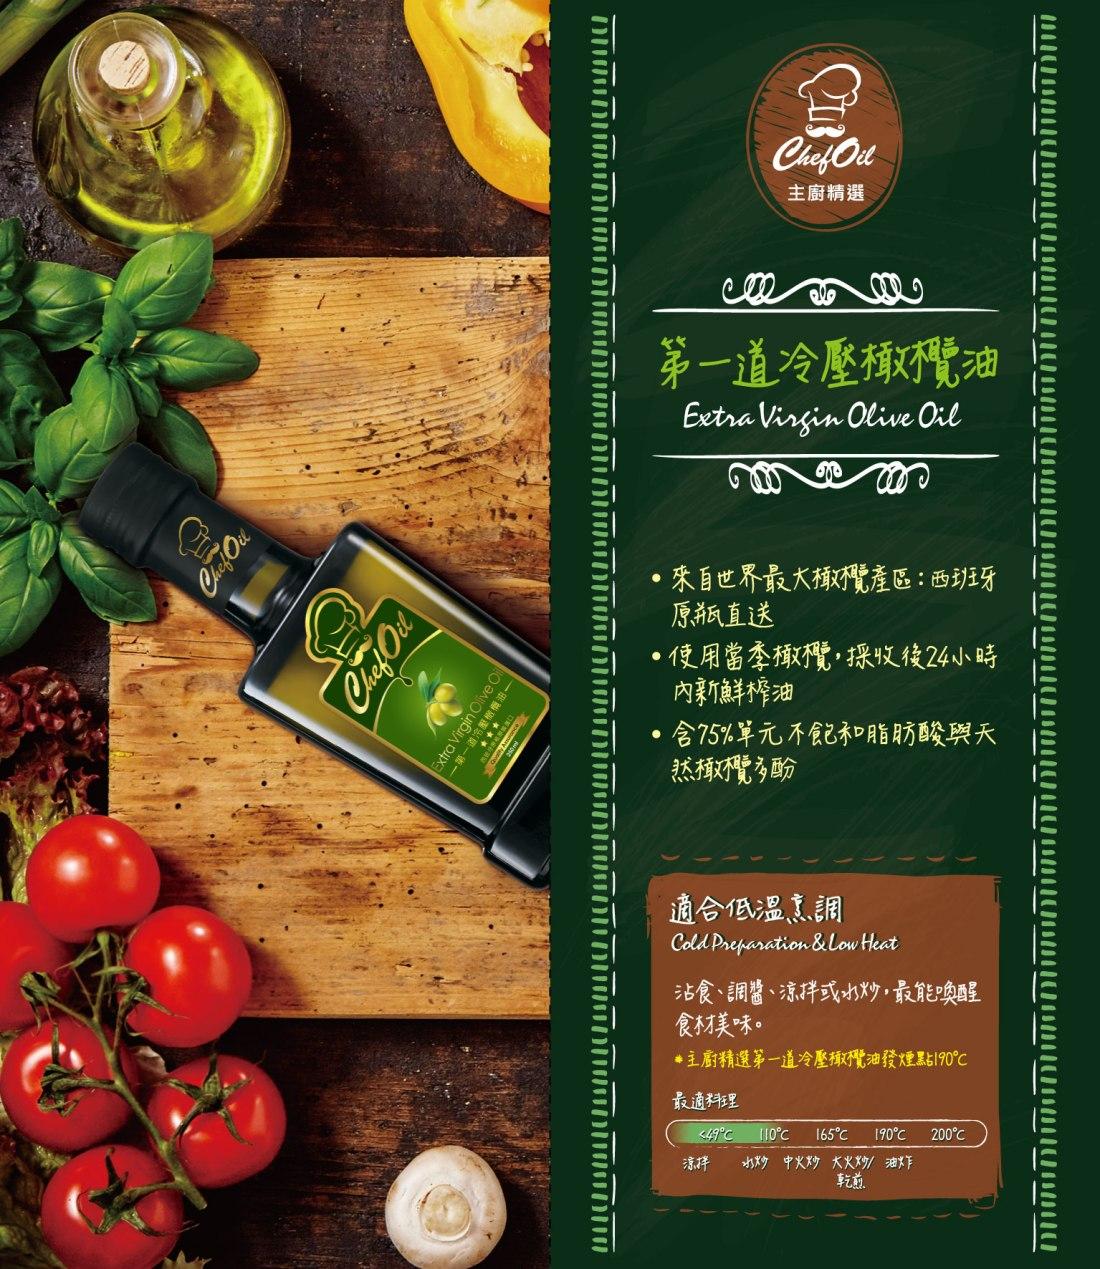 Taisun_主廚精選_Brochure設計(250ml)_P02-03_20170606_1.jpg